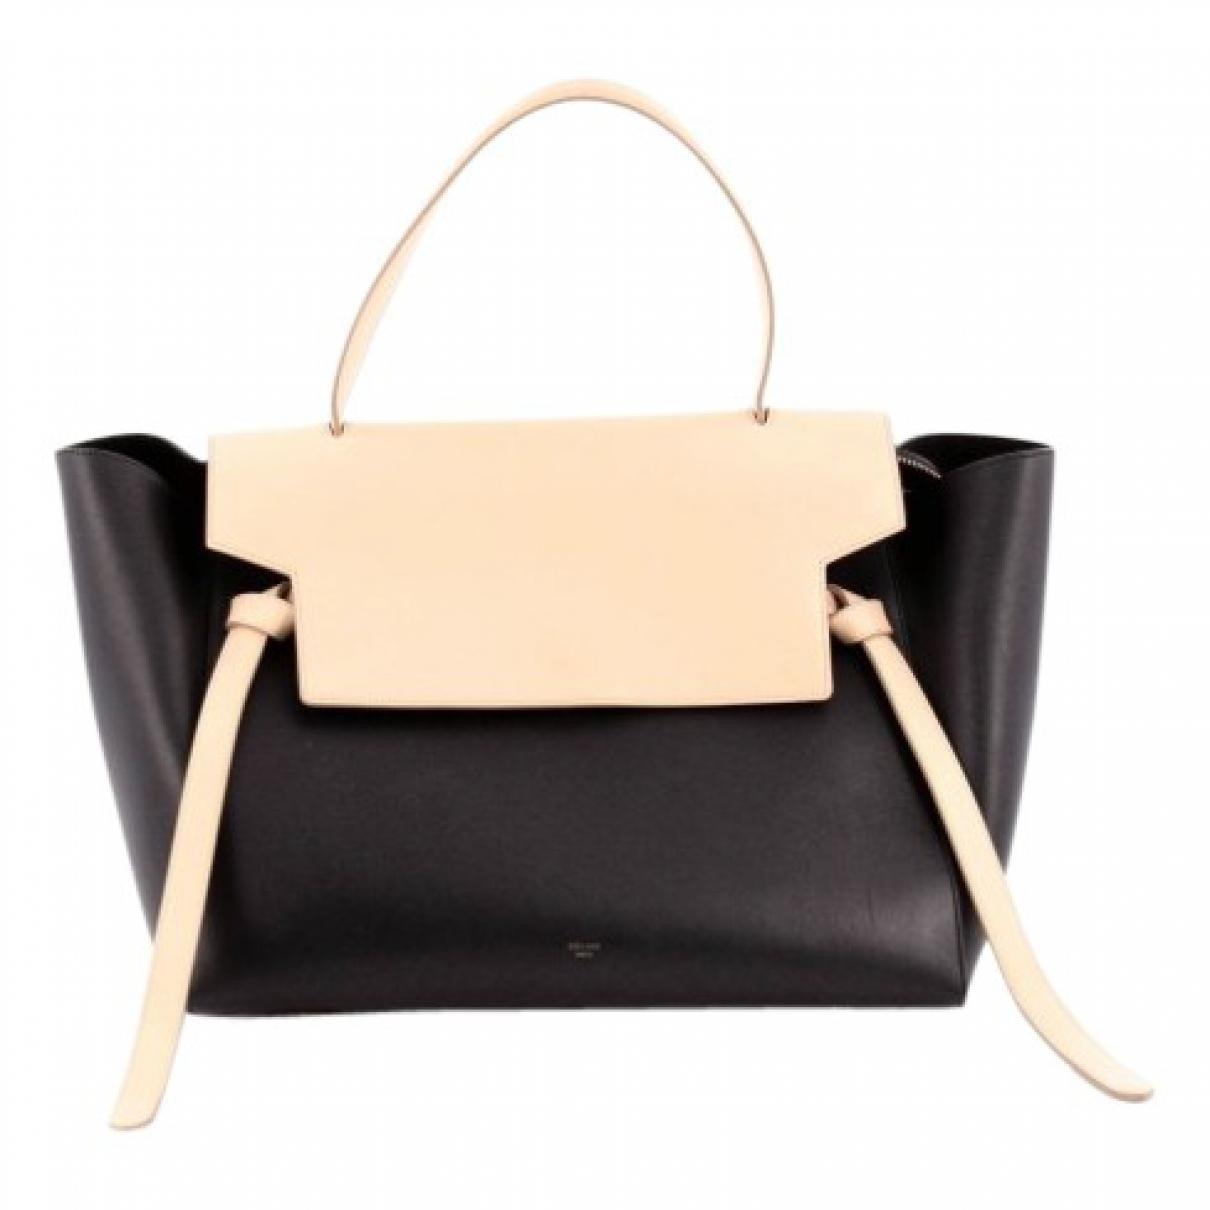 Lyst - Céline Pre-owned Belt Leather Handbag in Black 724c08a1a4608